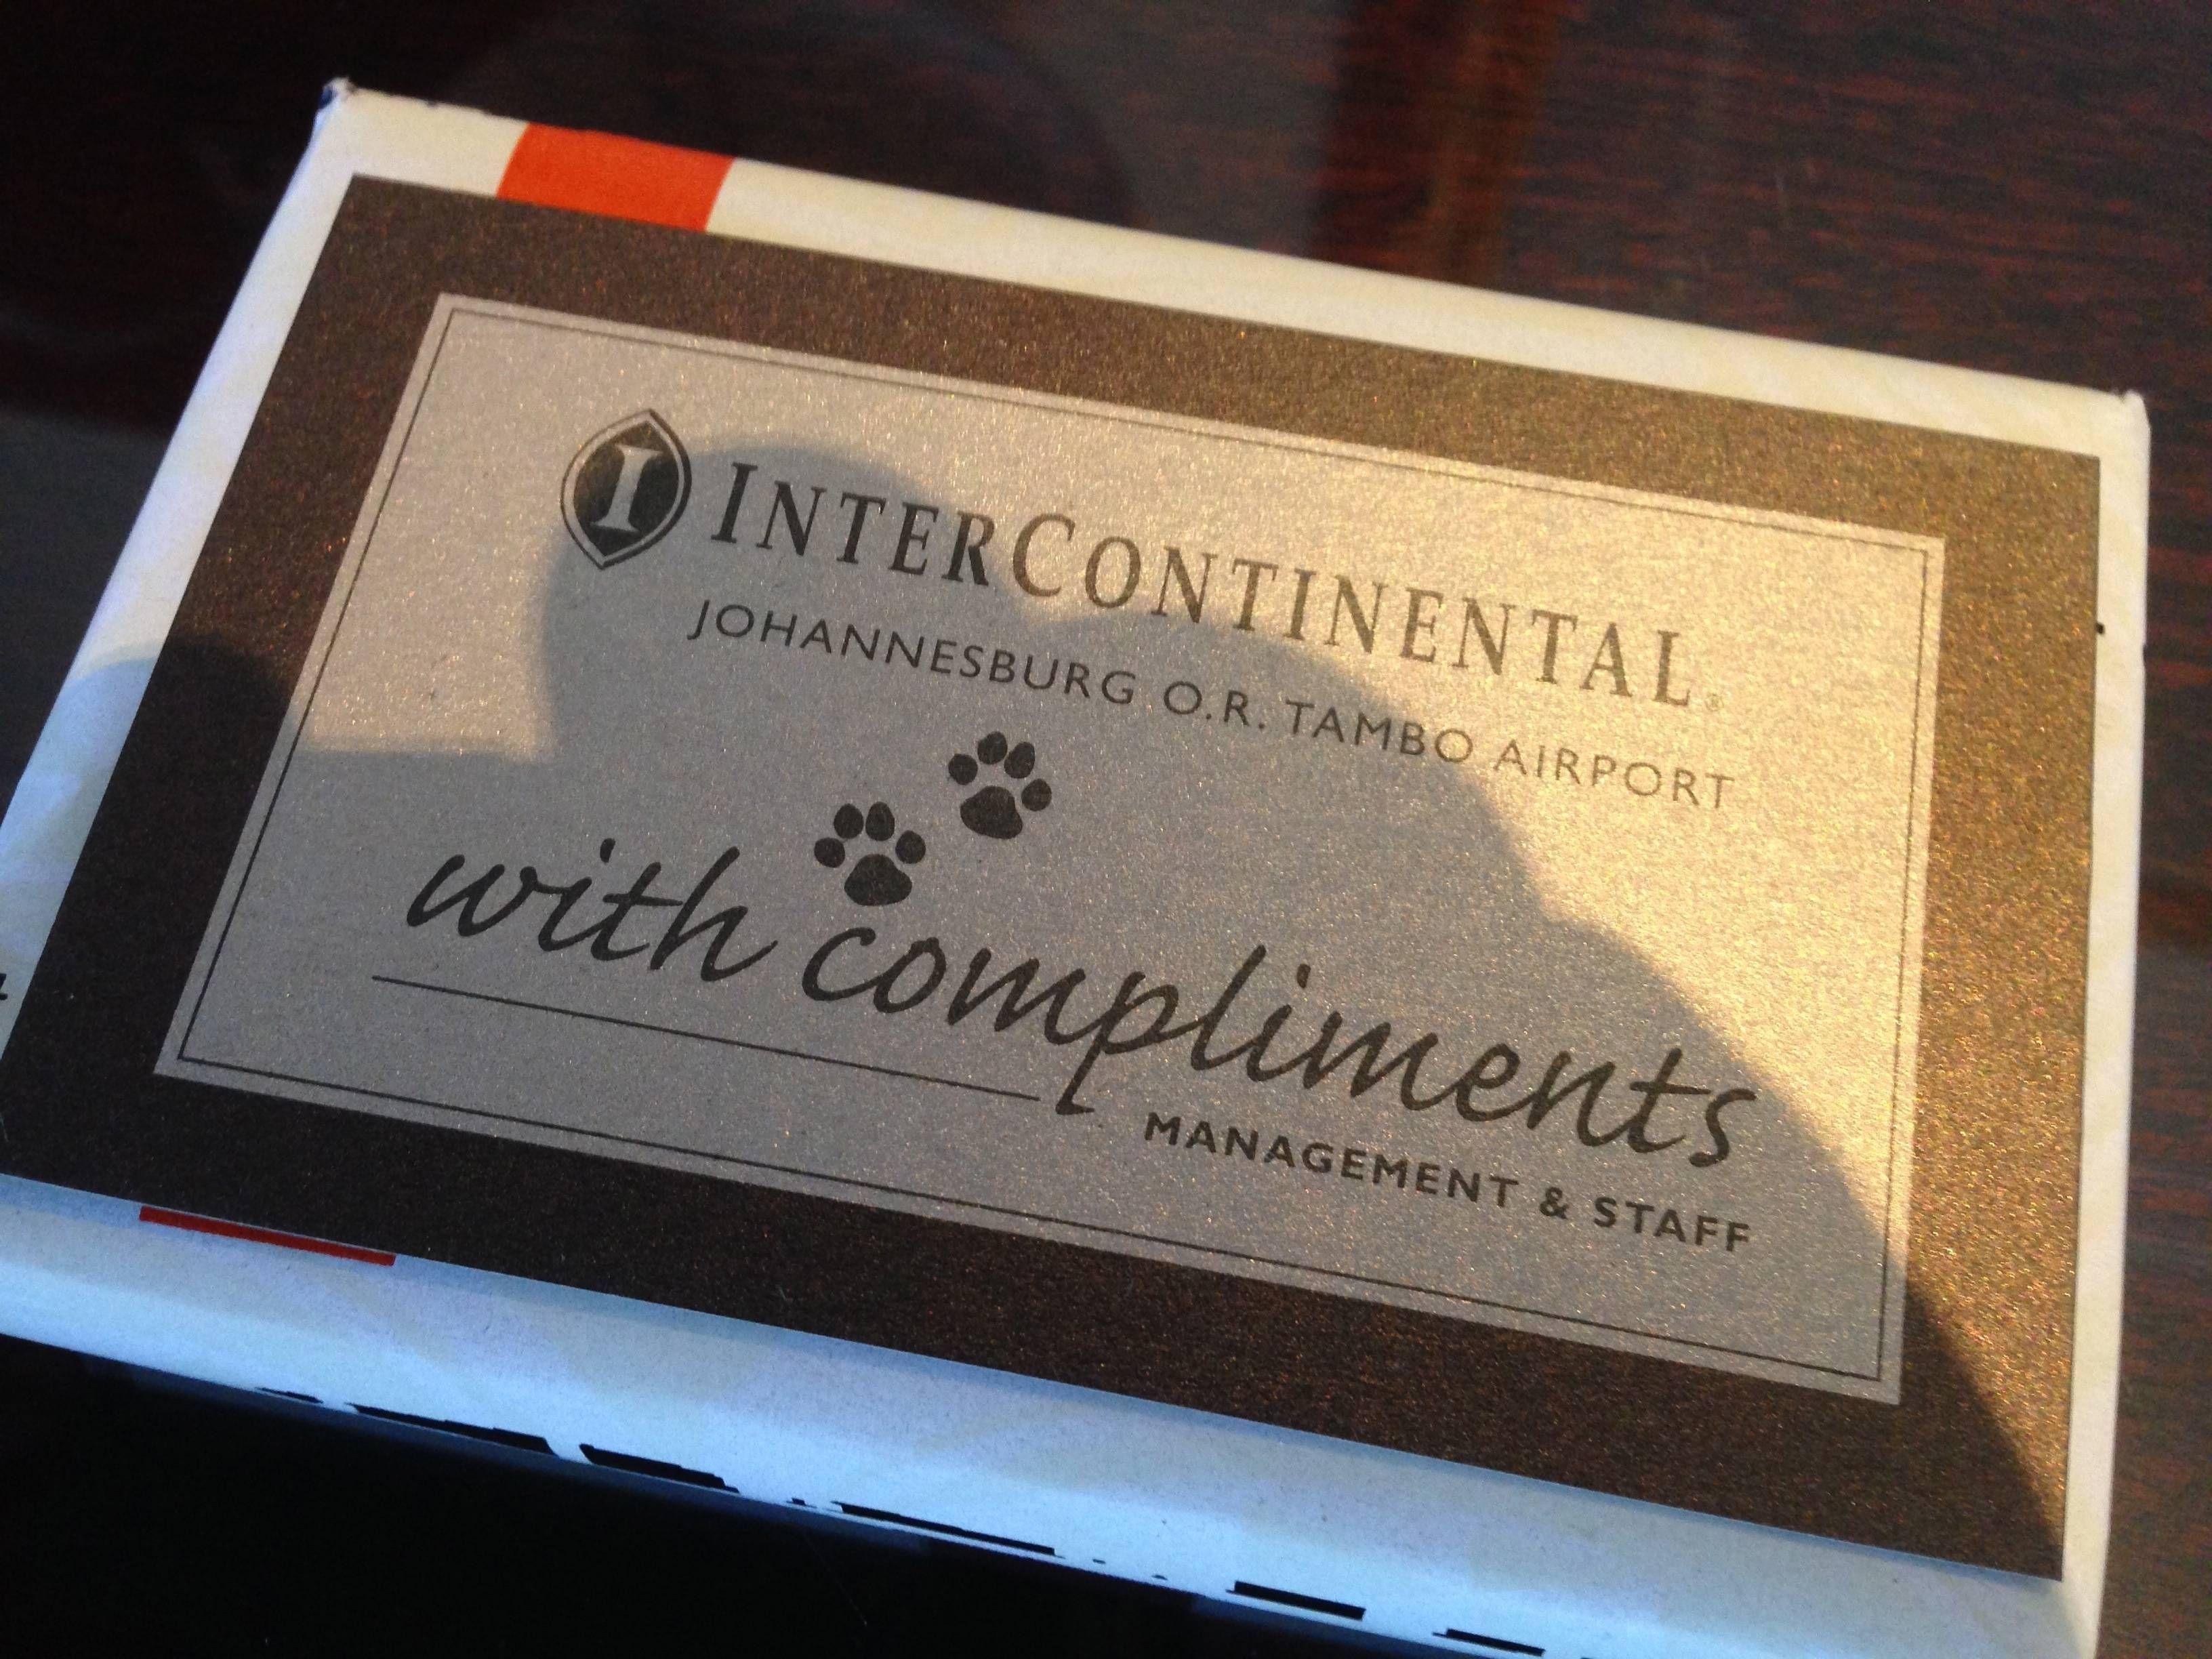 Intercontinental OR Tambo Airport Johannesburg